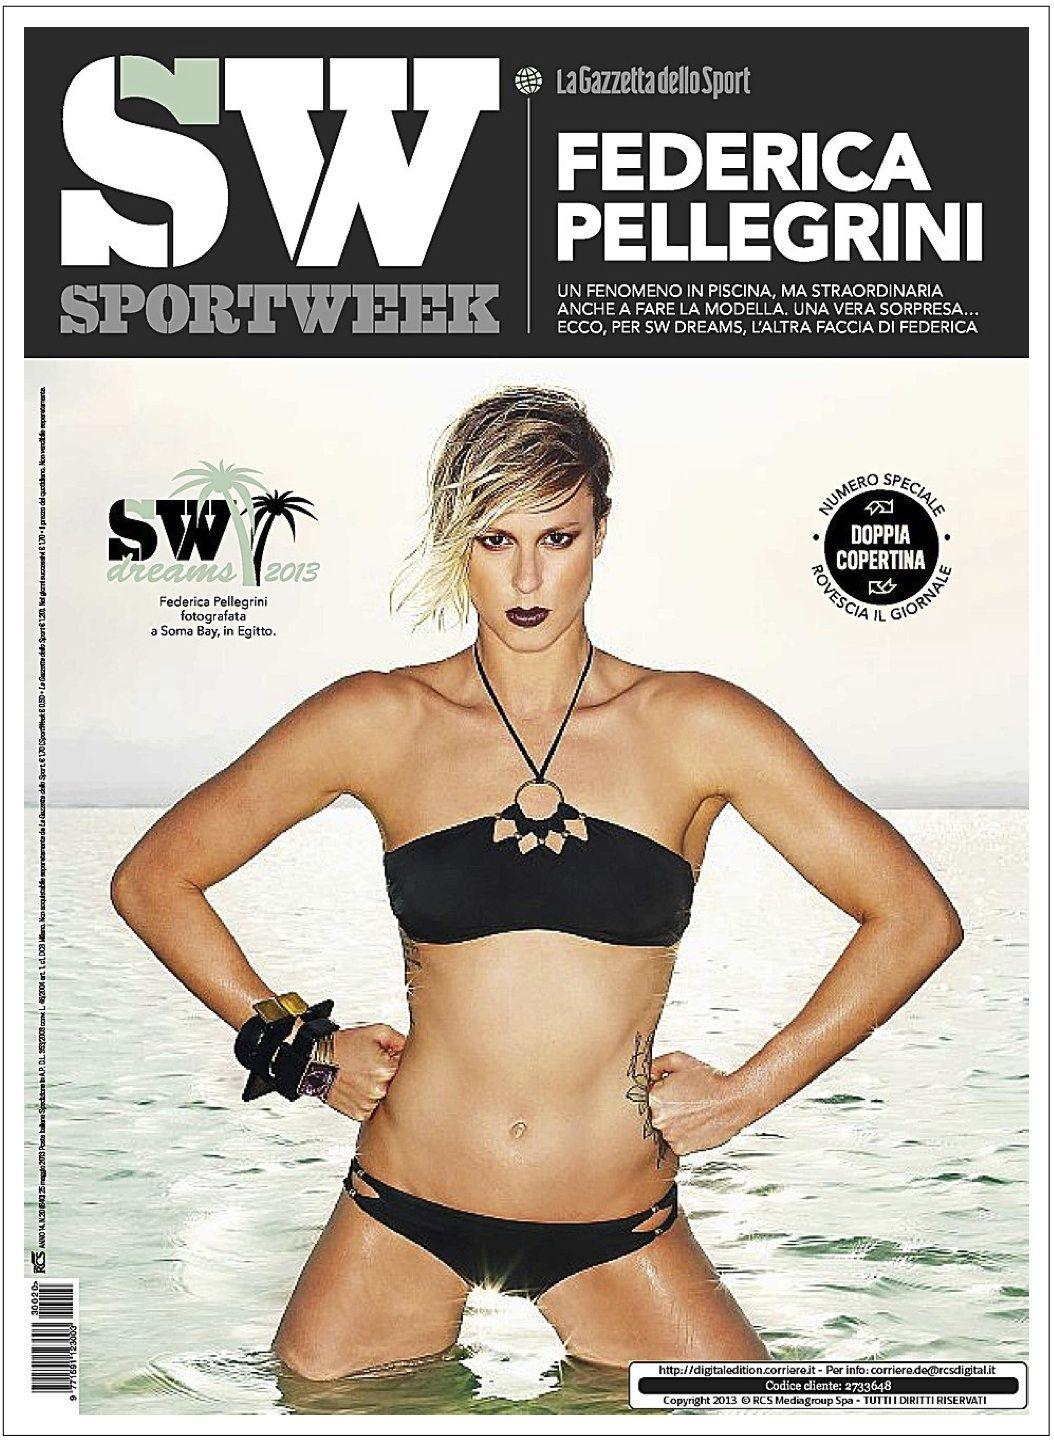 nagykereskedelem designer divat promóciós kód Federica Pellegrini visited us with Sport Week magazine for an ...